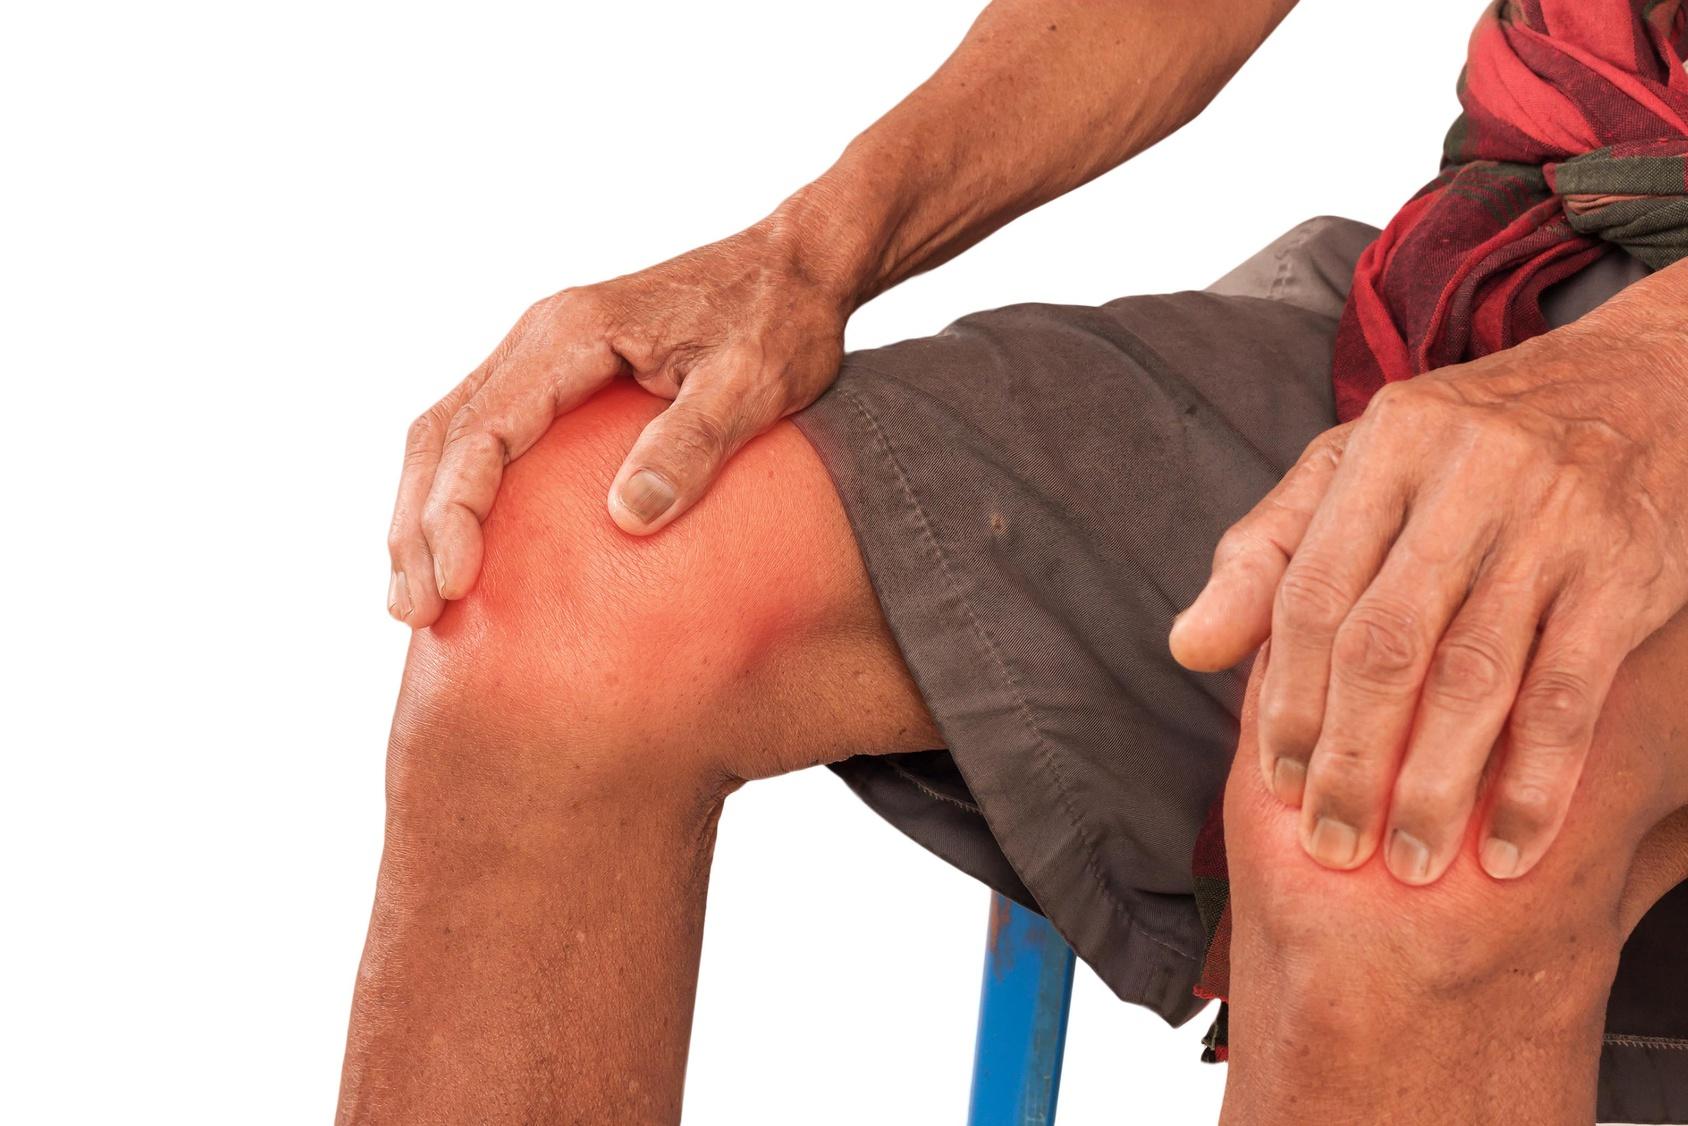 Fisioterapia en la artrosis de rodilla - Segovia